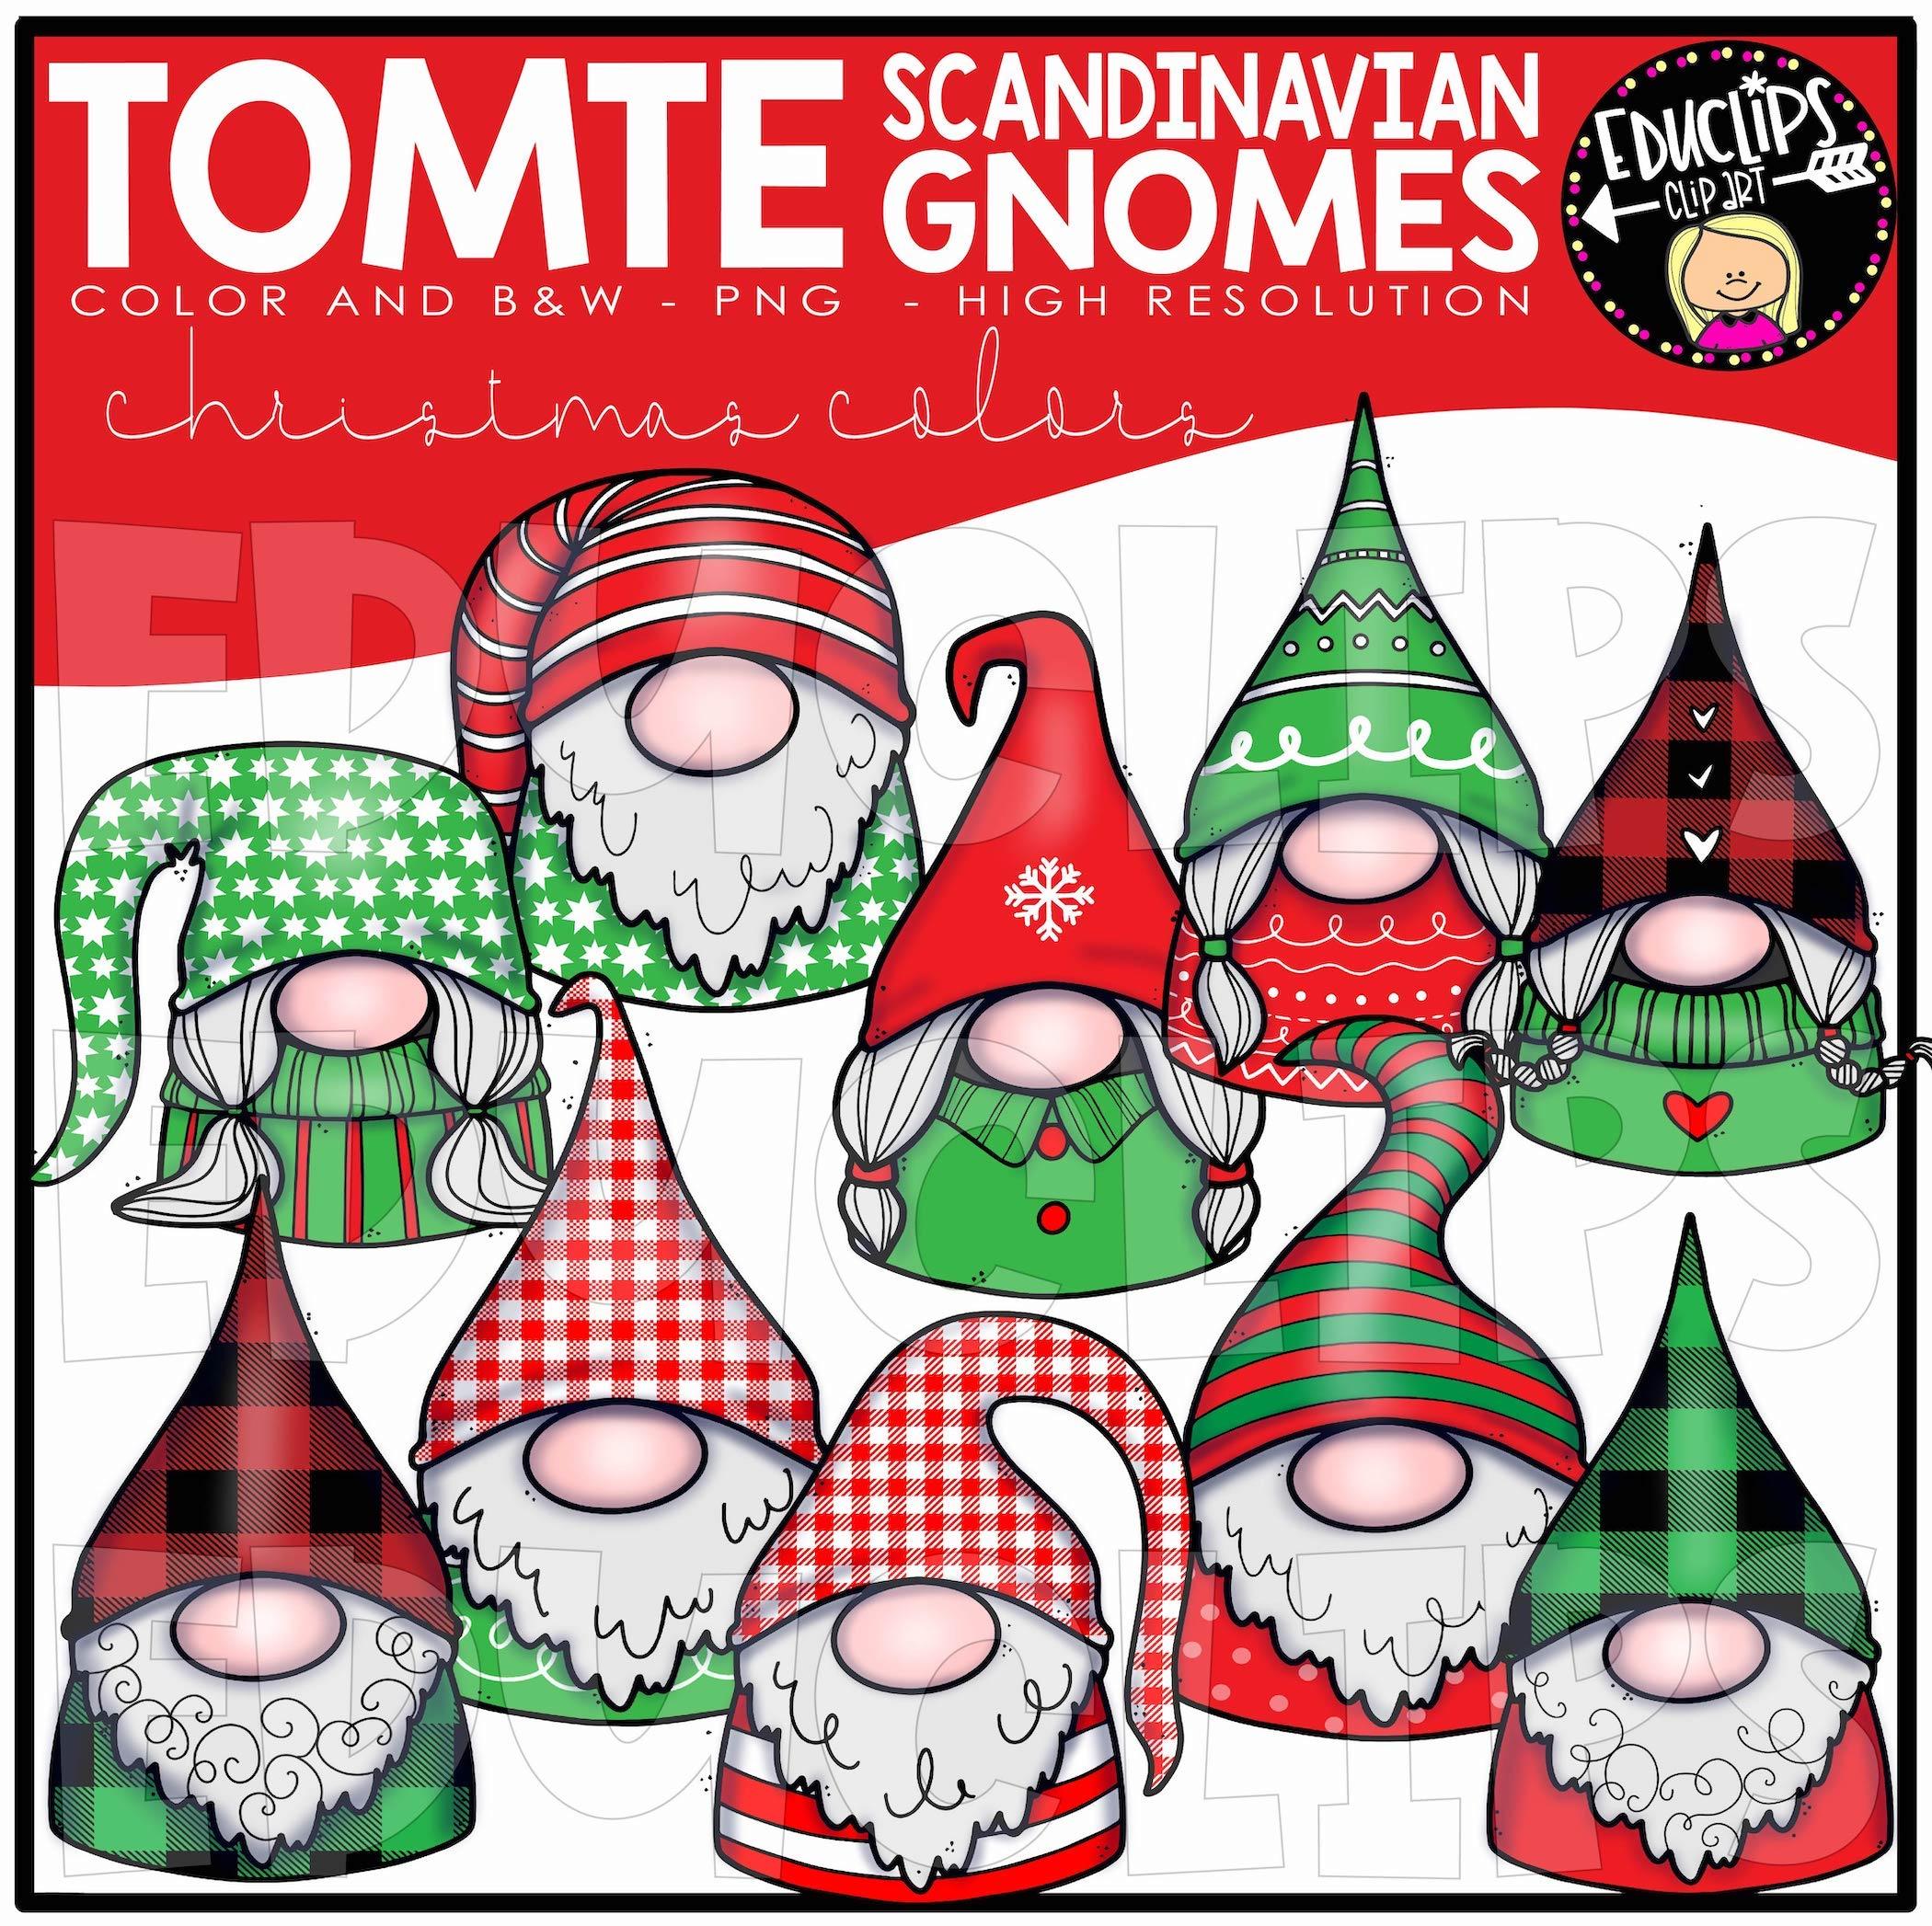 Tomte - Mini Scandinavian Gnomes Clip